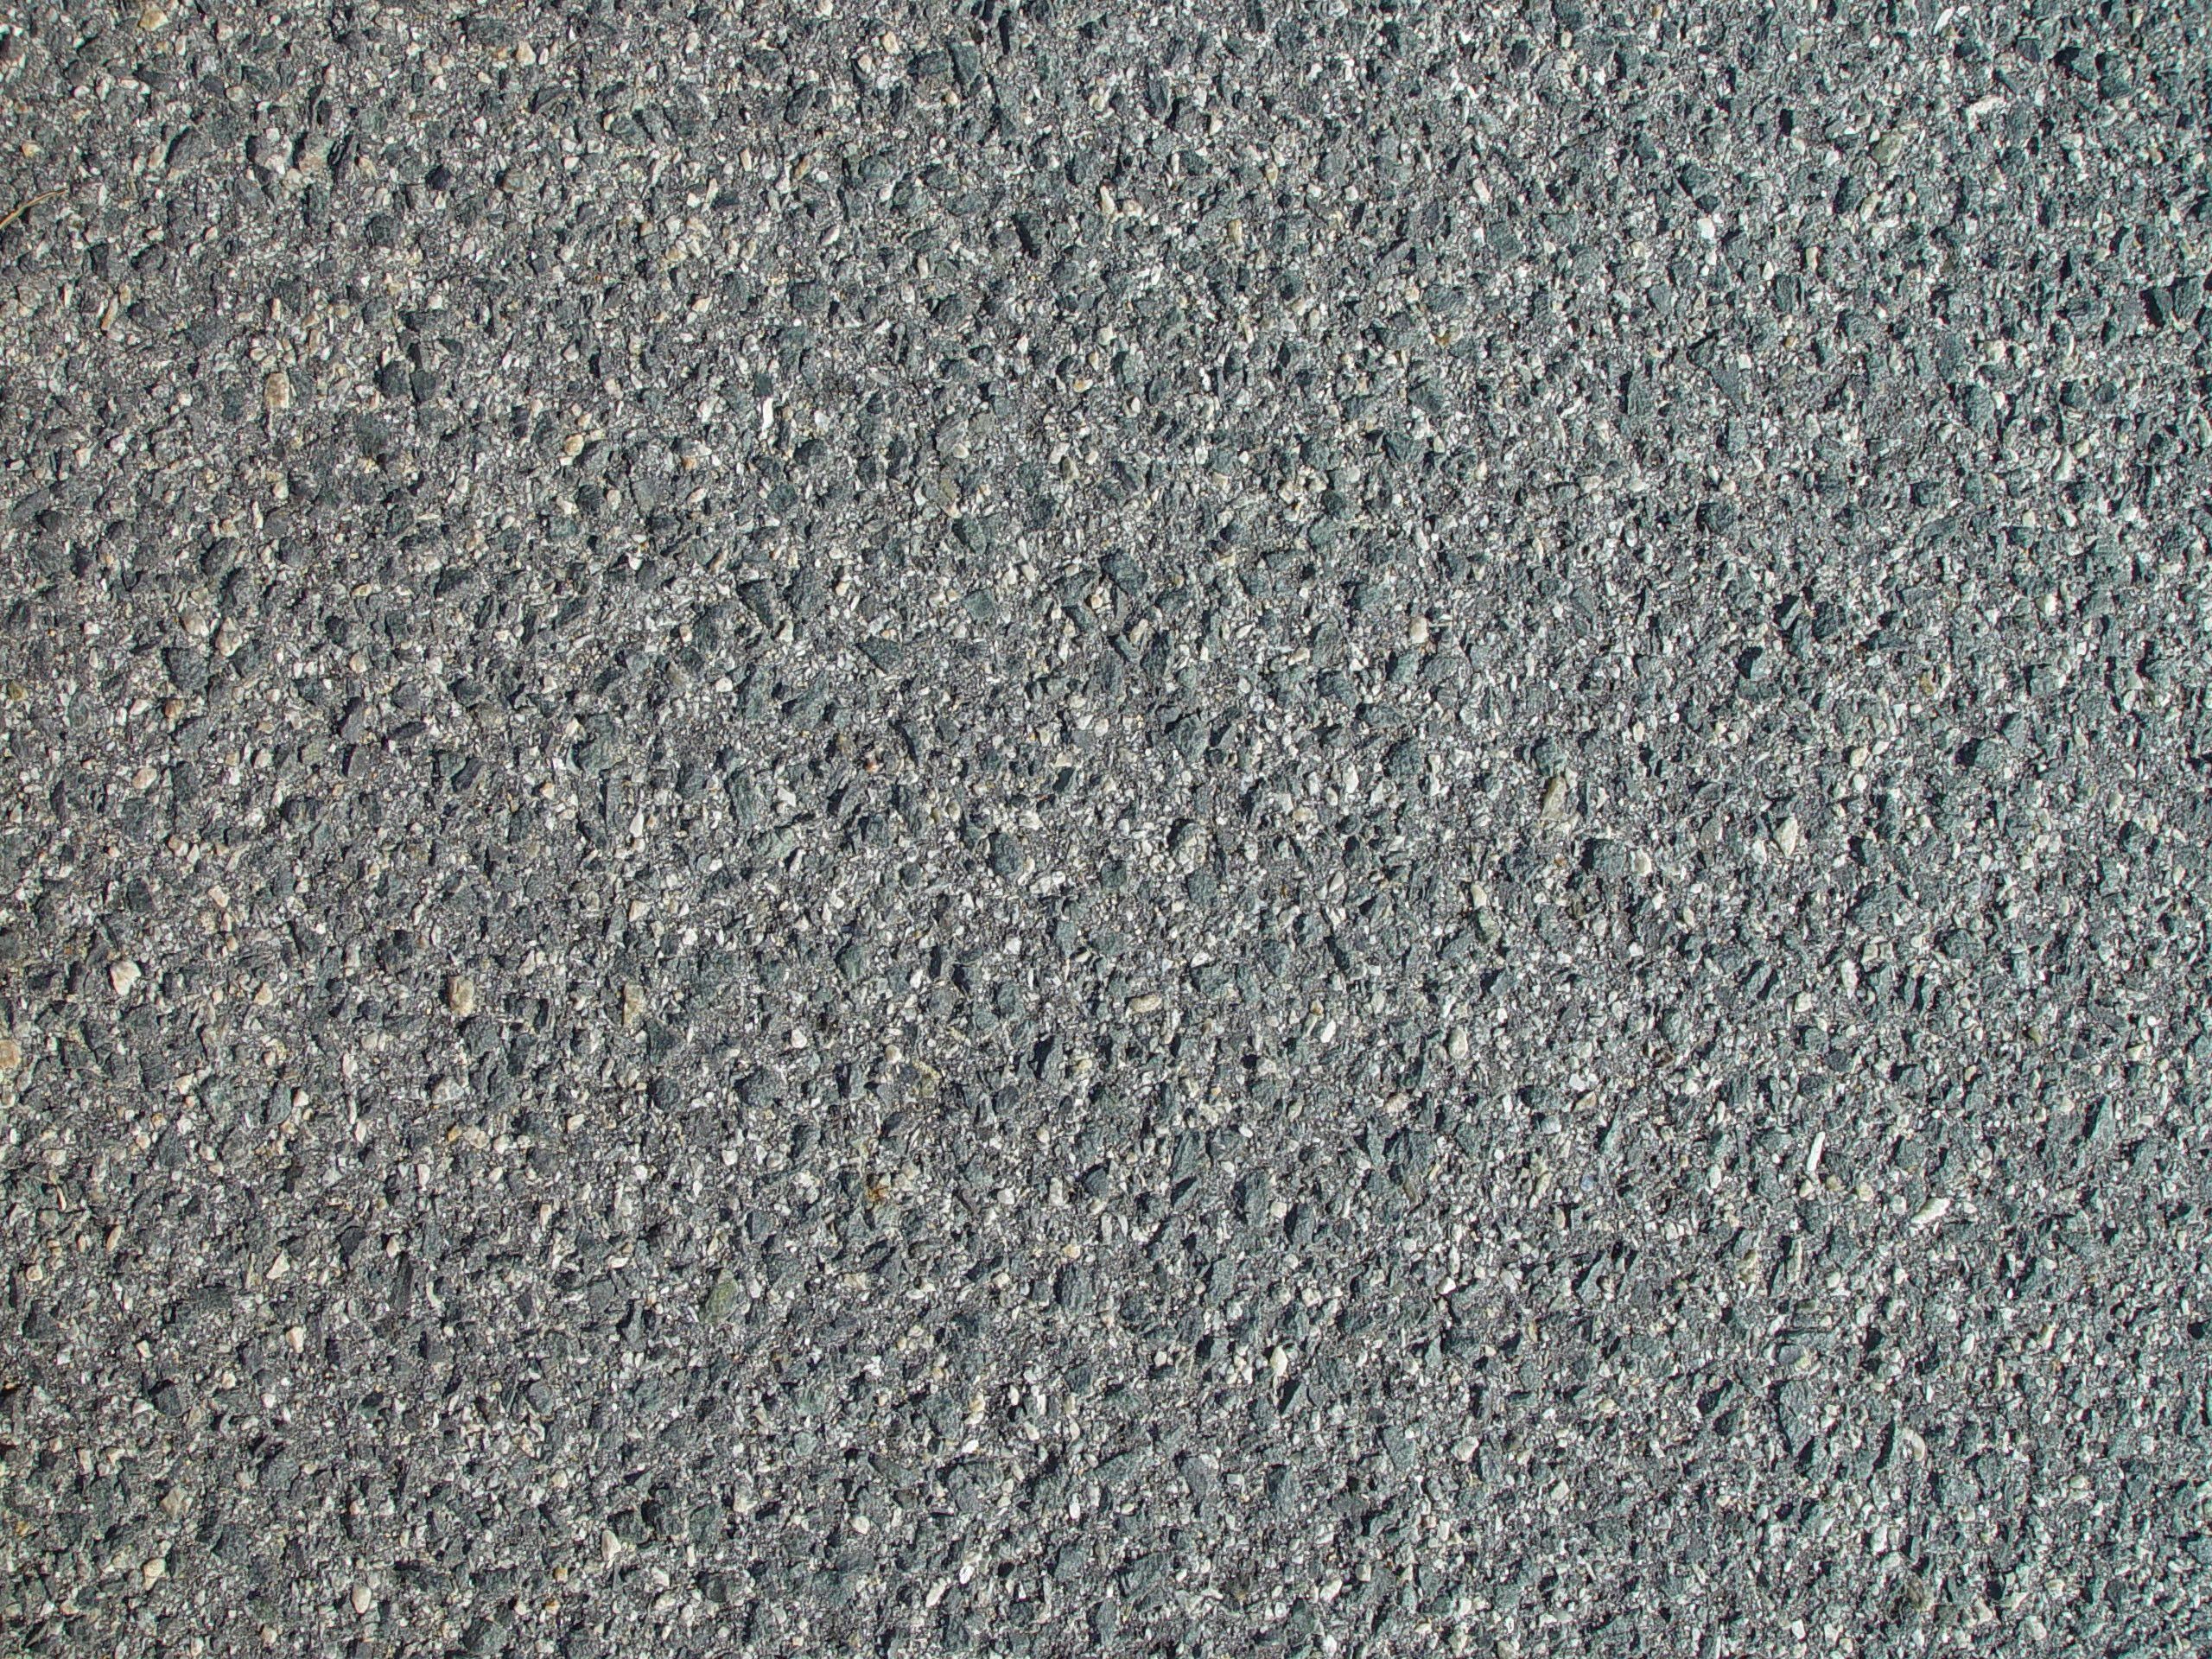 File hotmix bitumen texture jpg wikimedia commons